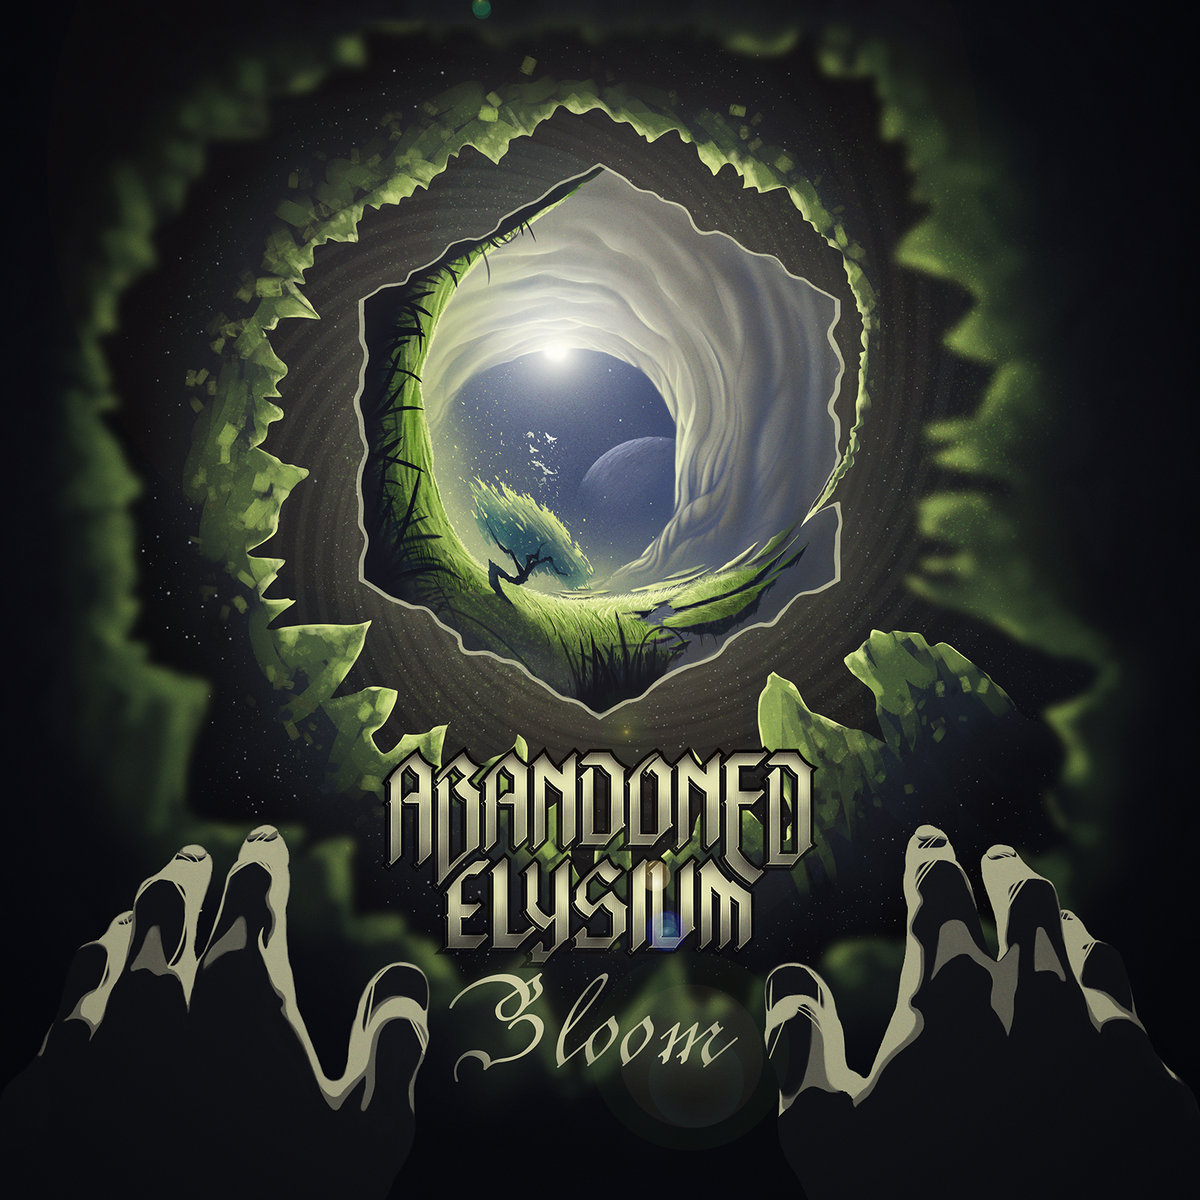 Abandoned Elysium - Bloom (2017)